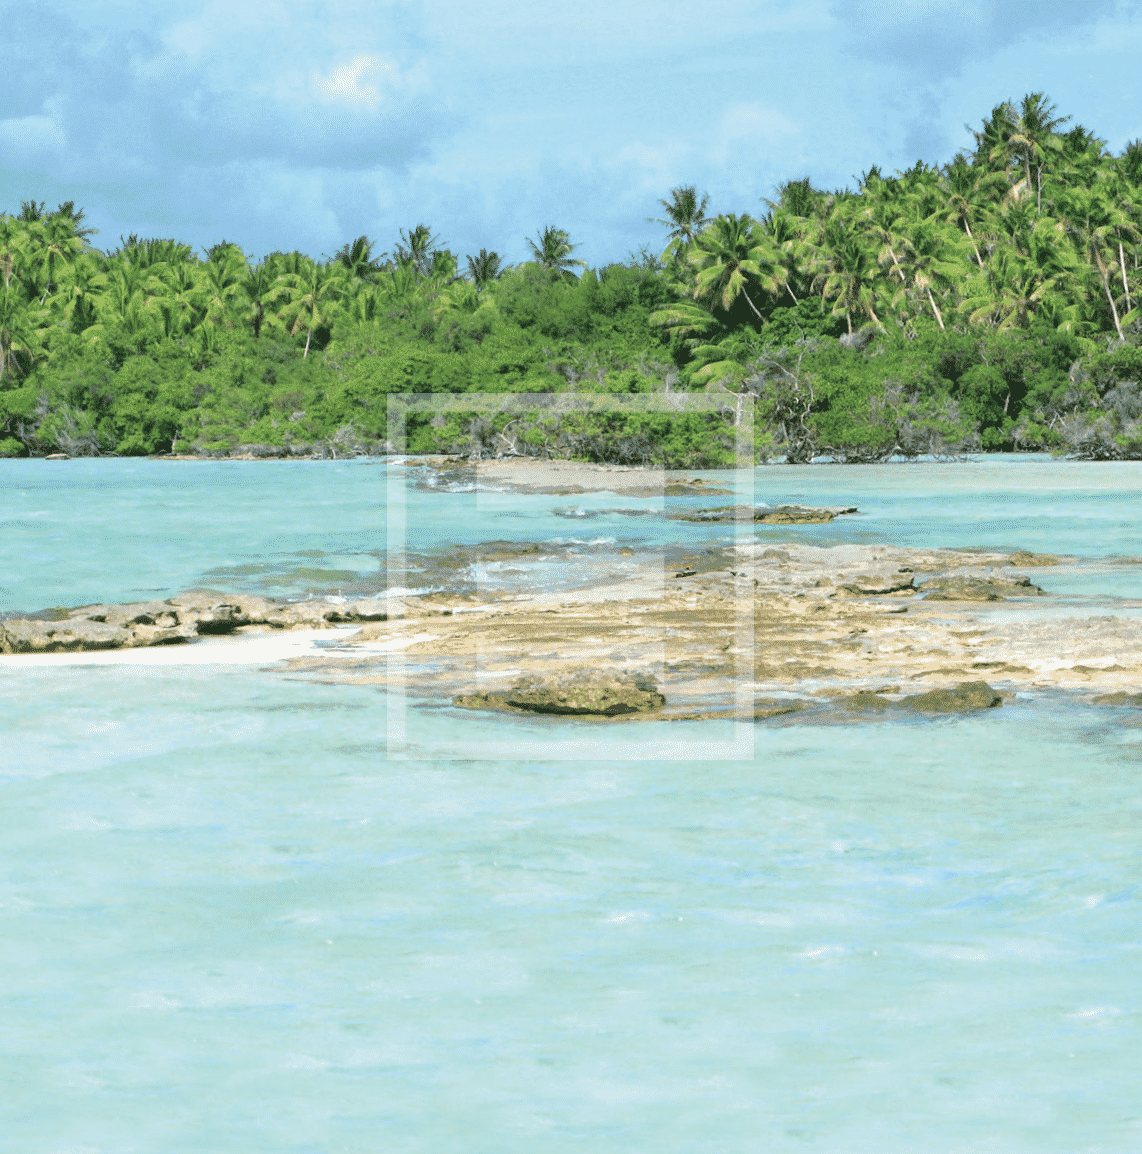 isole Marshall viaggio pacifico